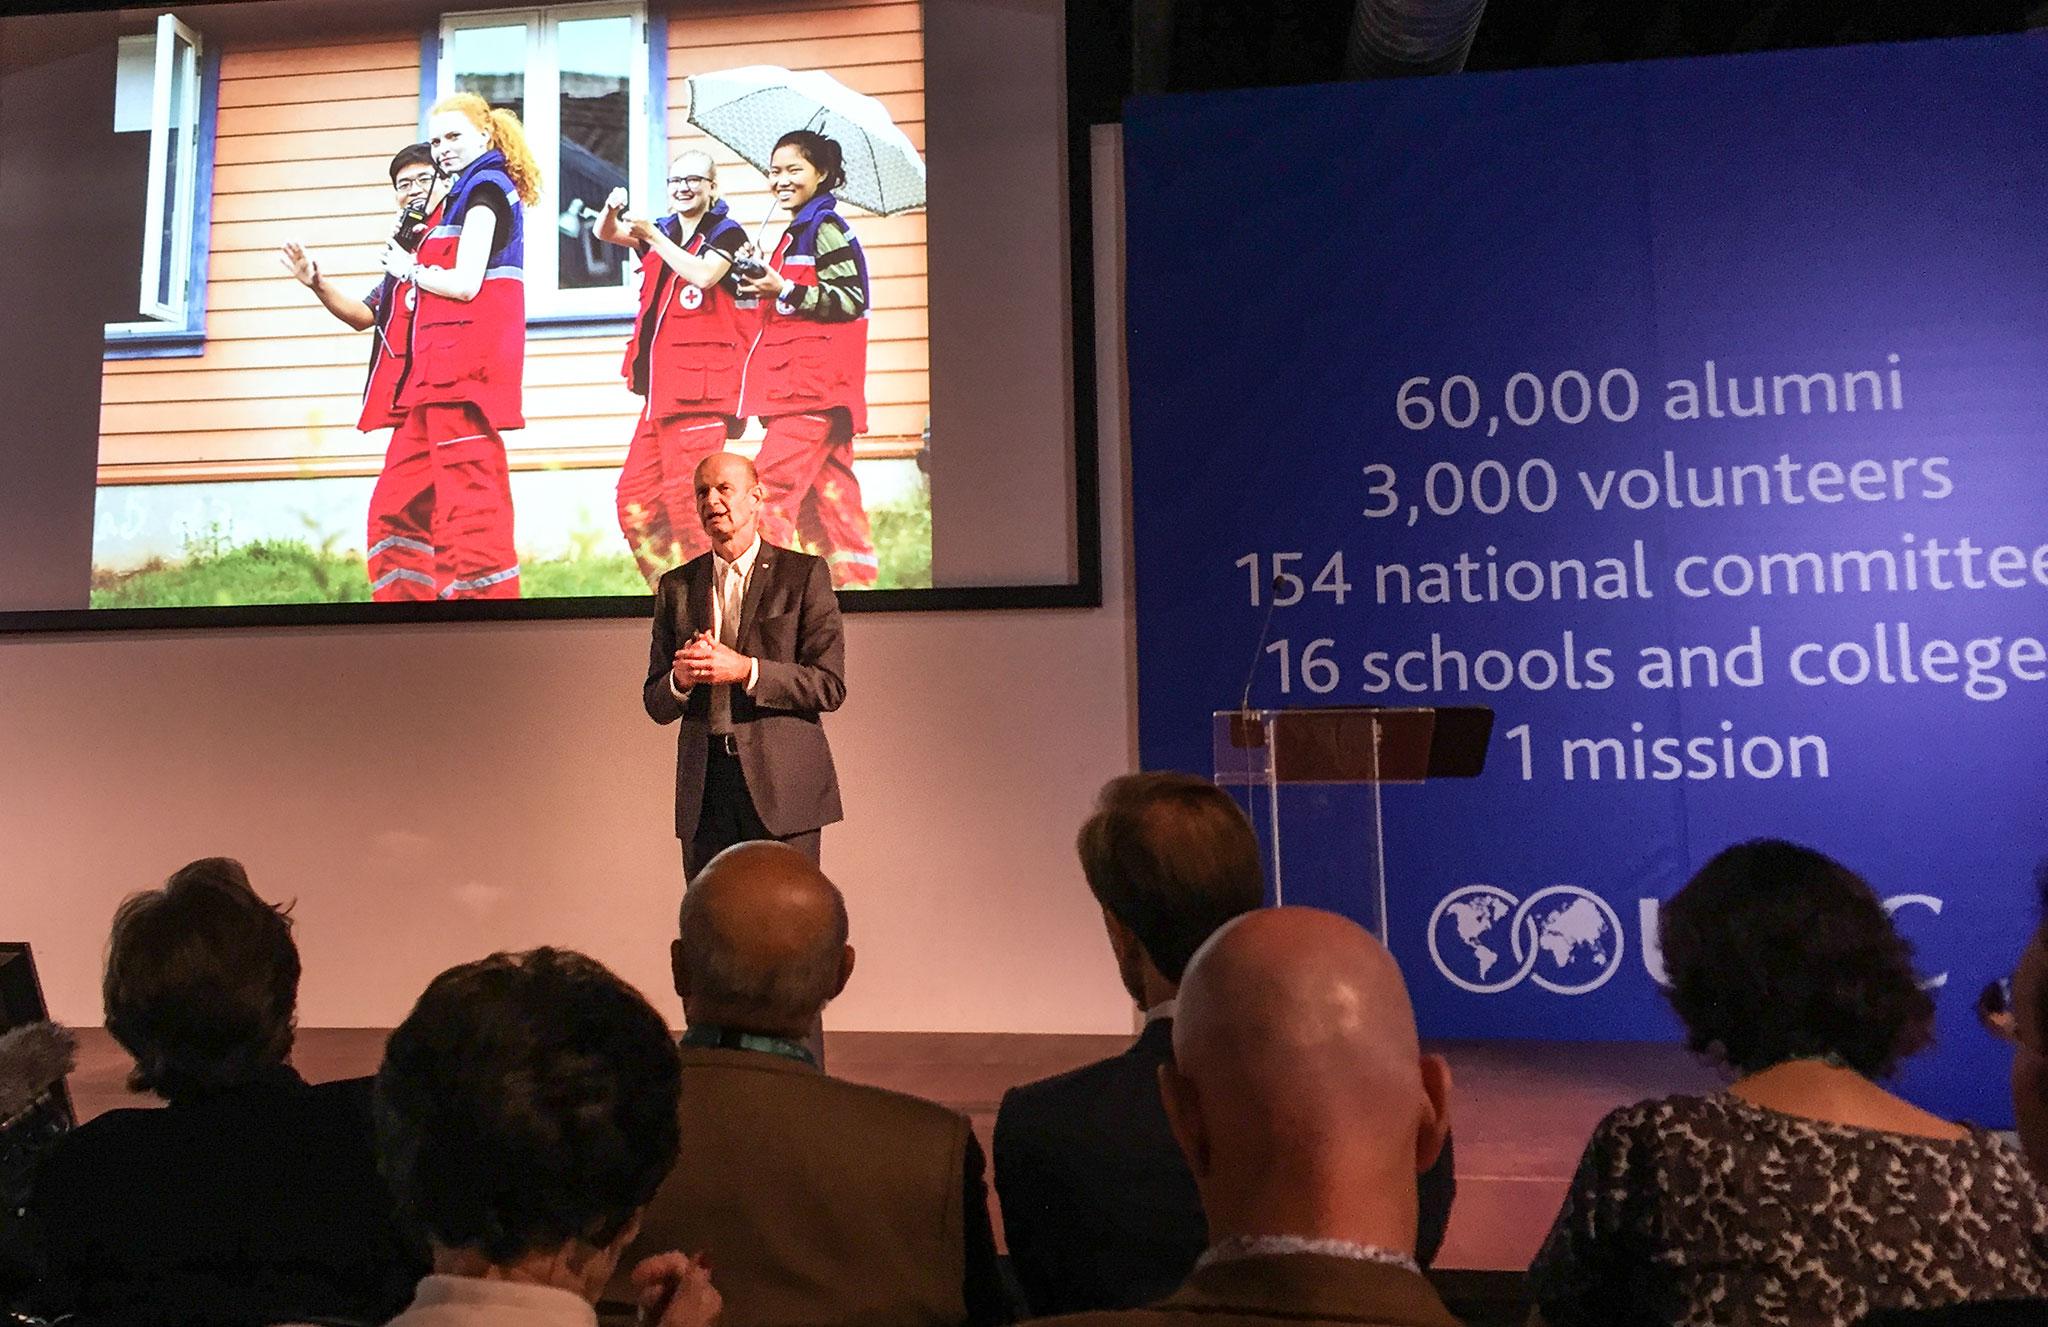 Sven Mollekeiv, President of the Norwegian Red Cross, delivering his keynote address